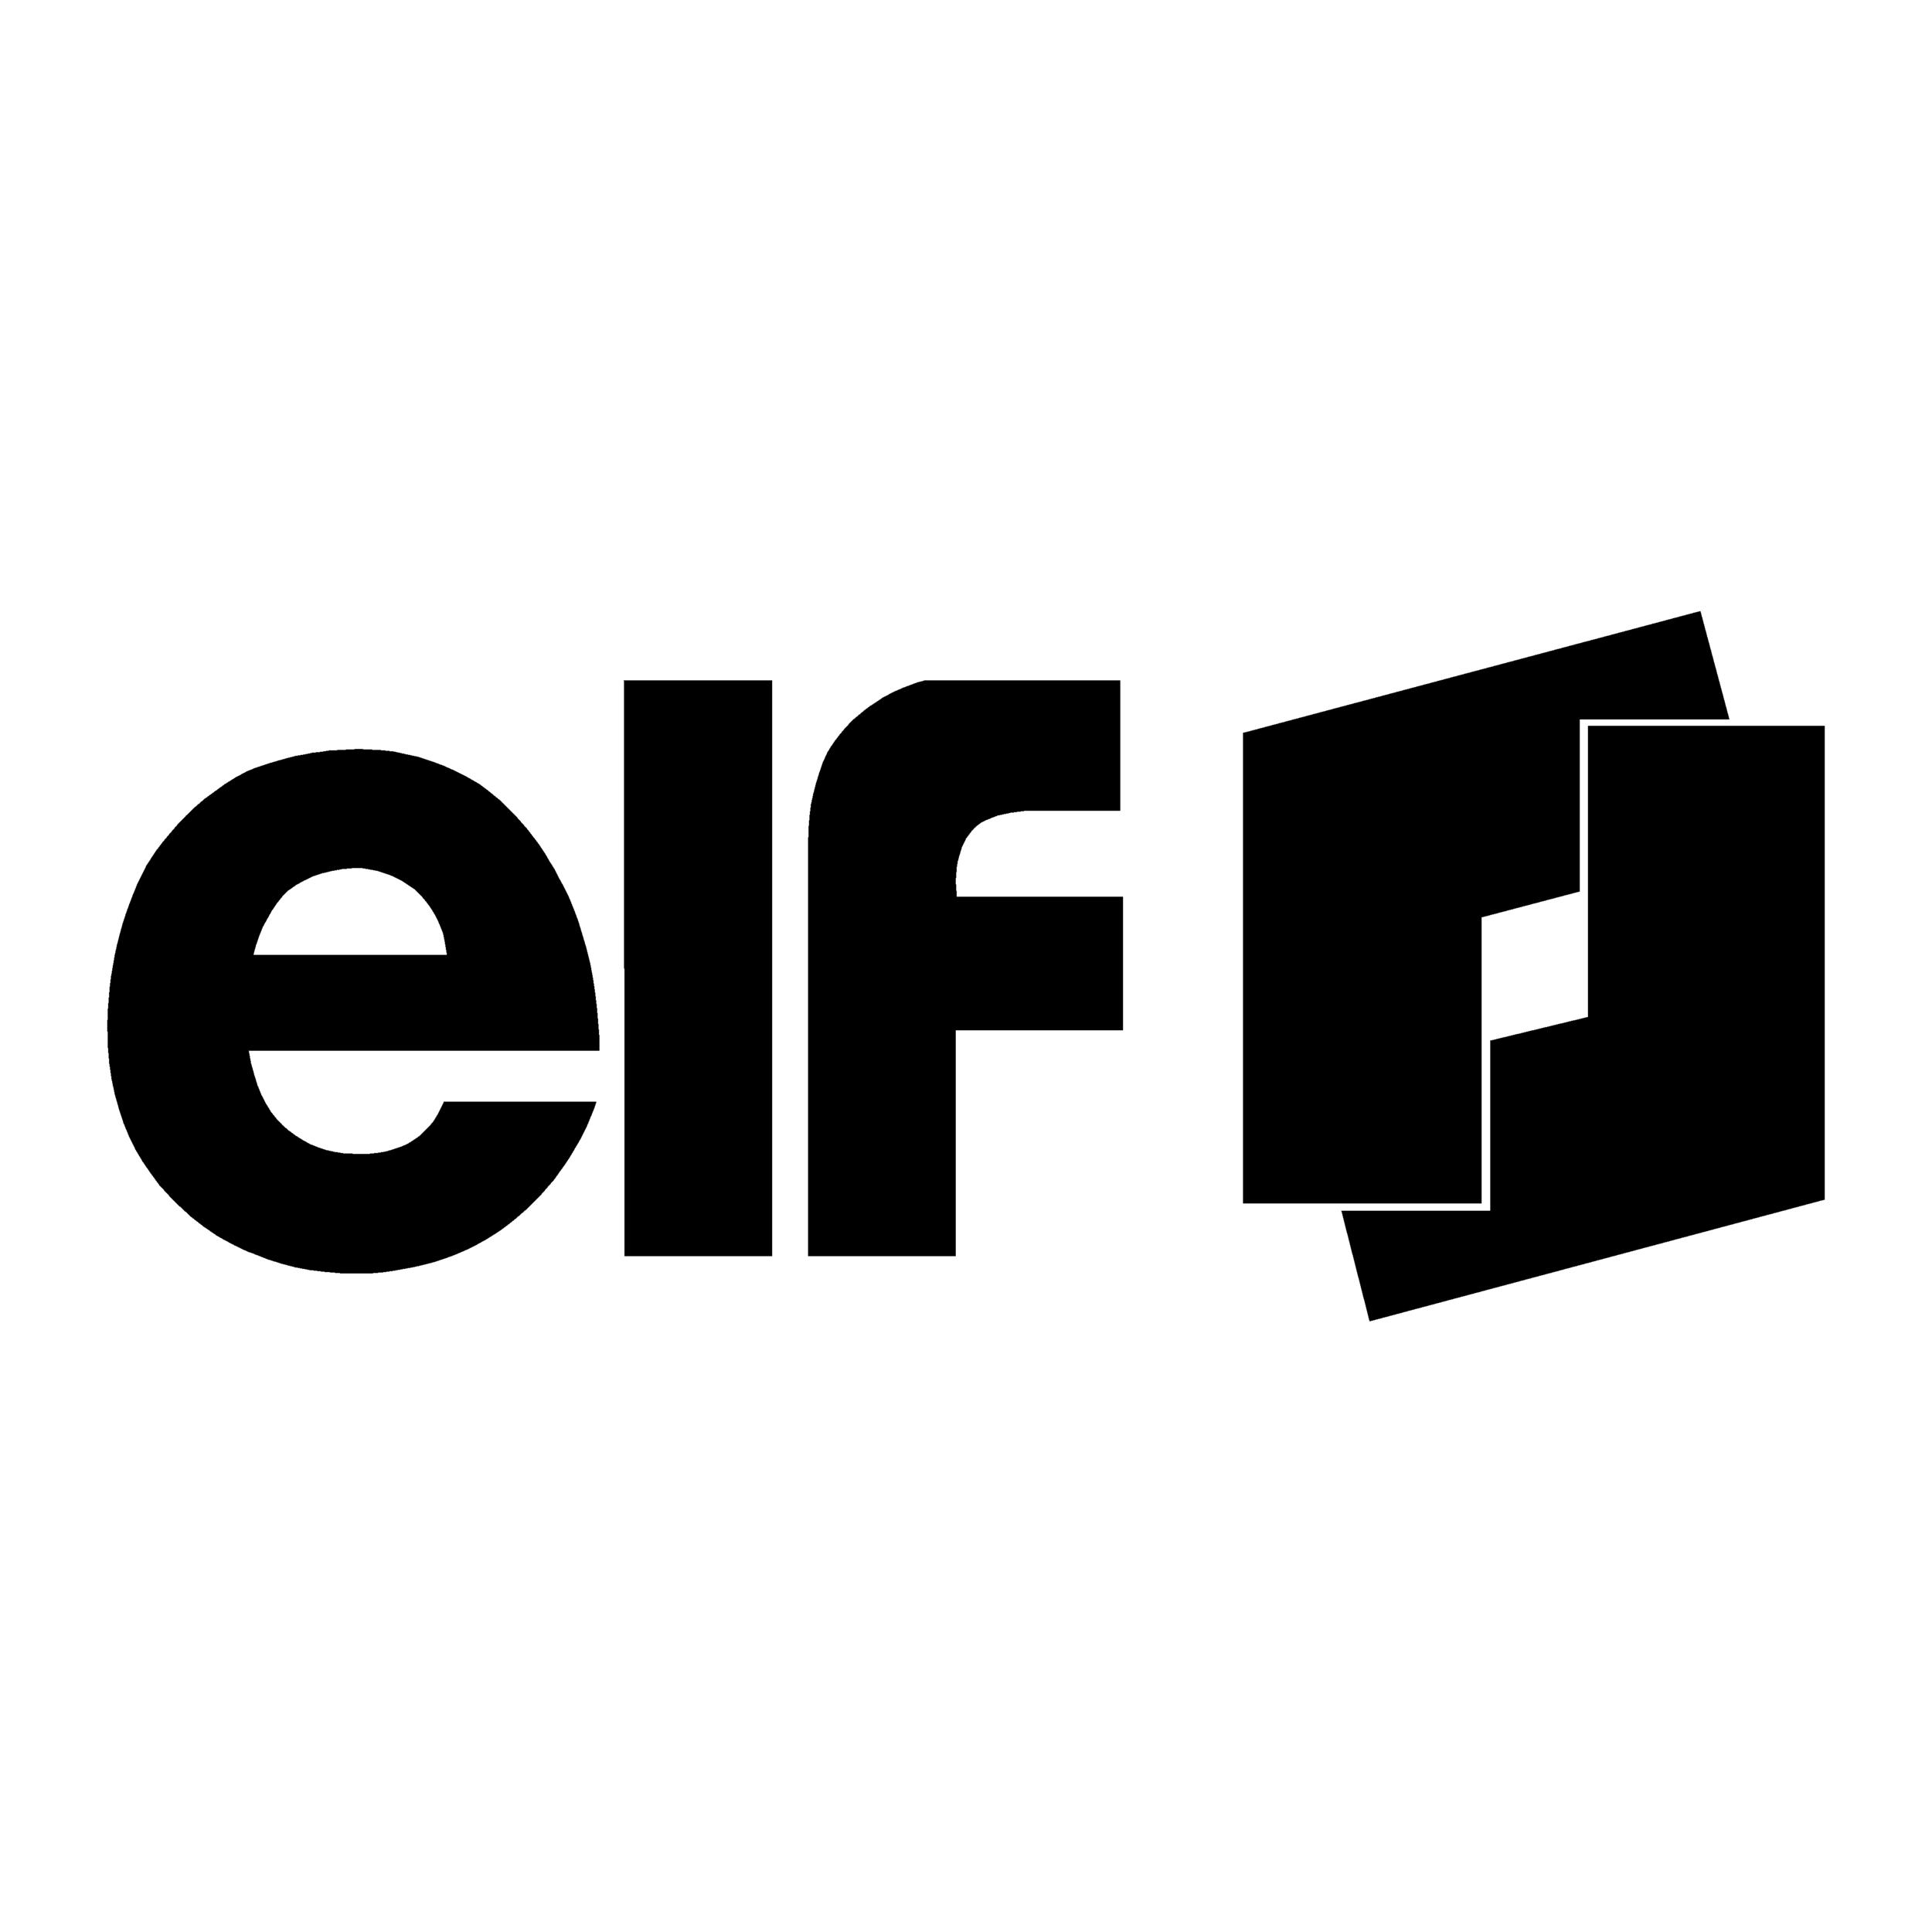 sticker-elf-ref-3-tuning-auto-moto-camion-competition-deco-rallye-autocollant-min